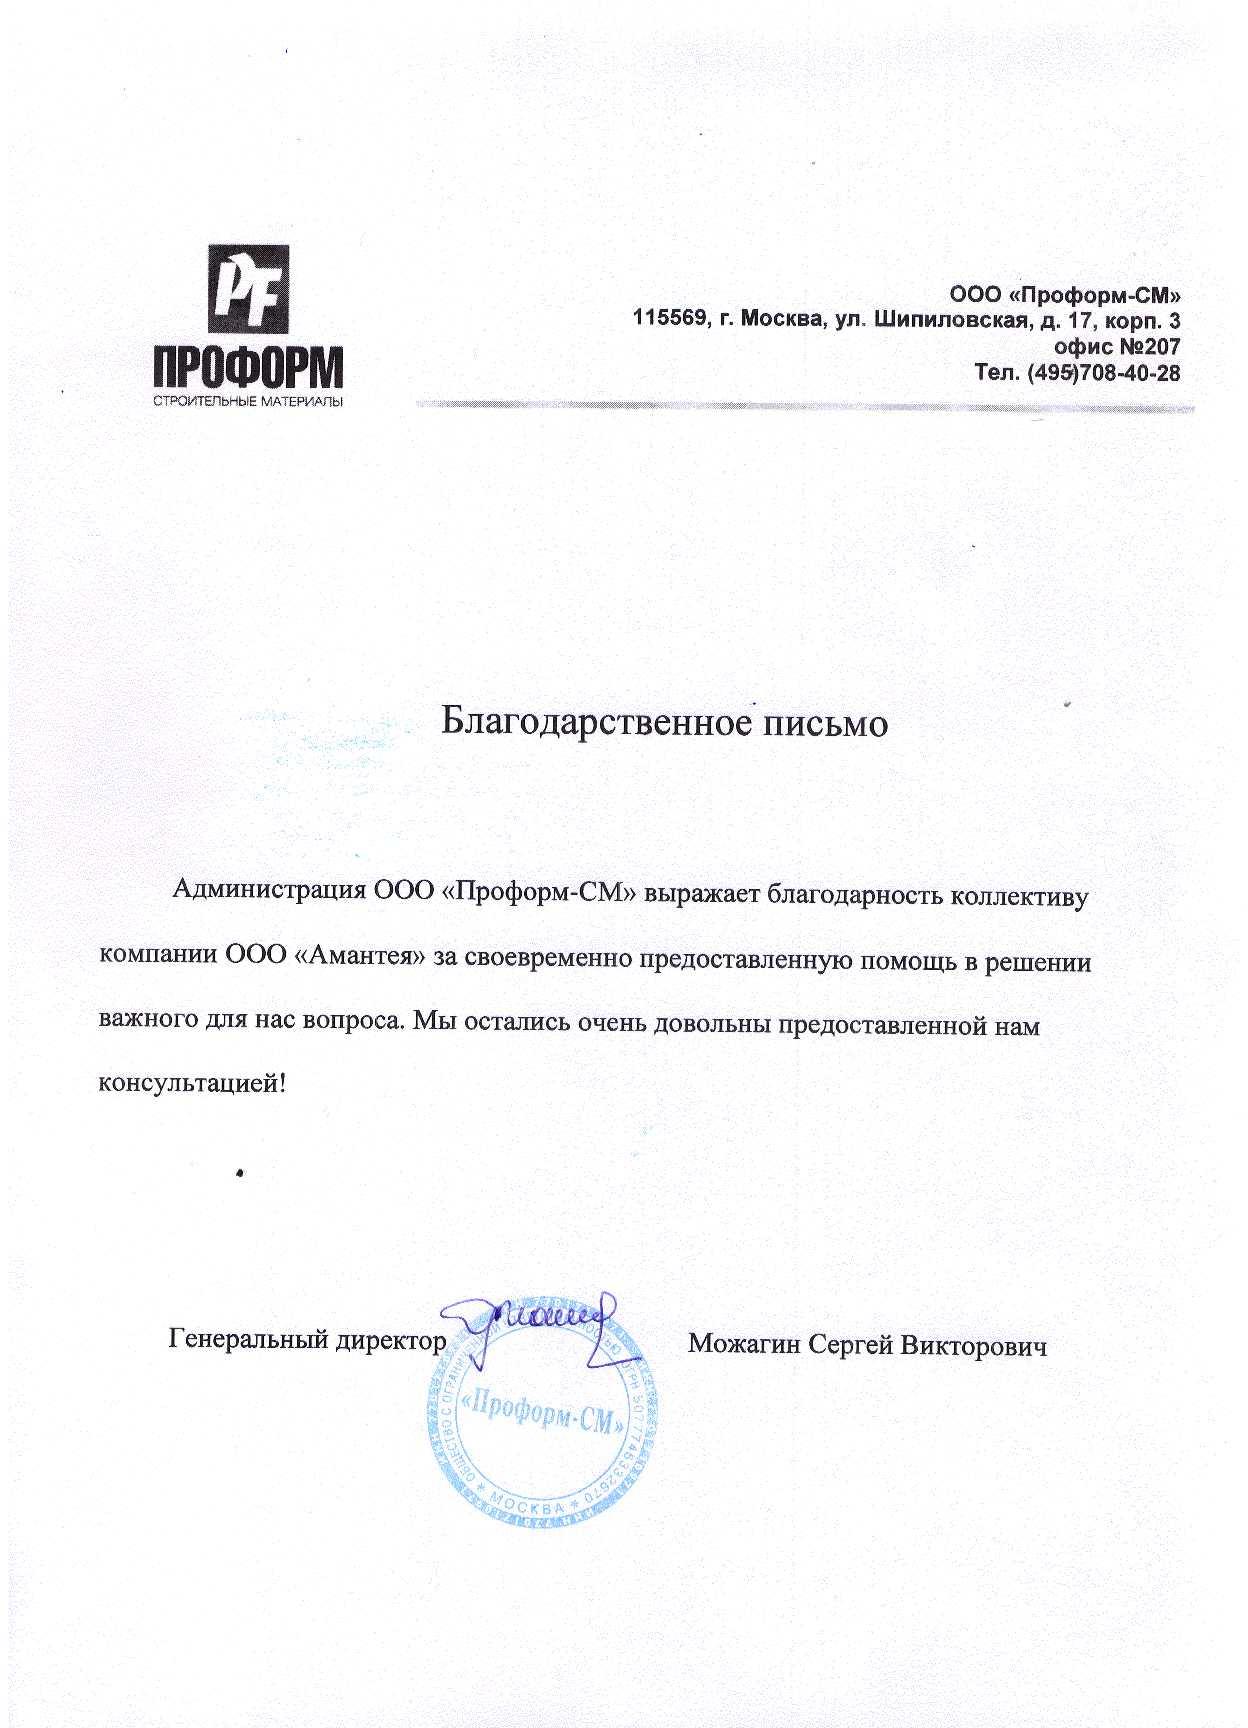 ООО Проформ СМ